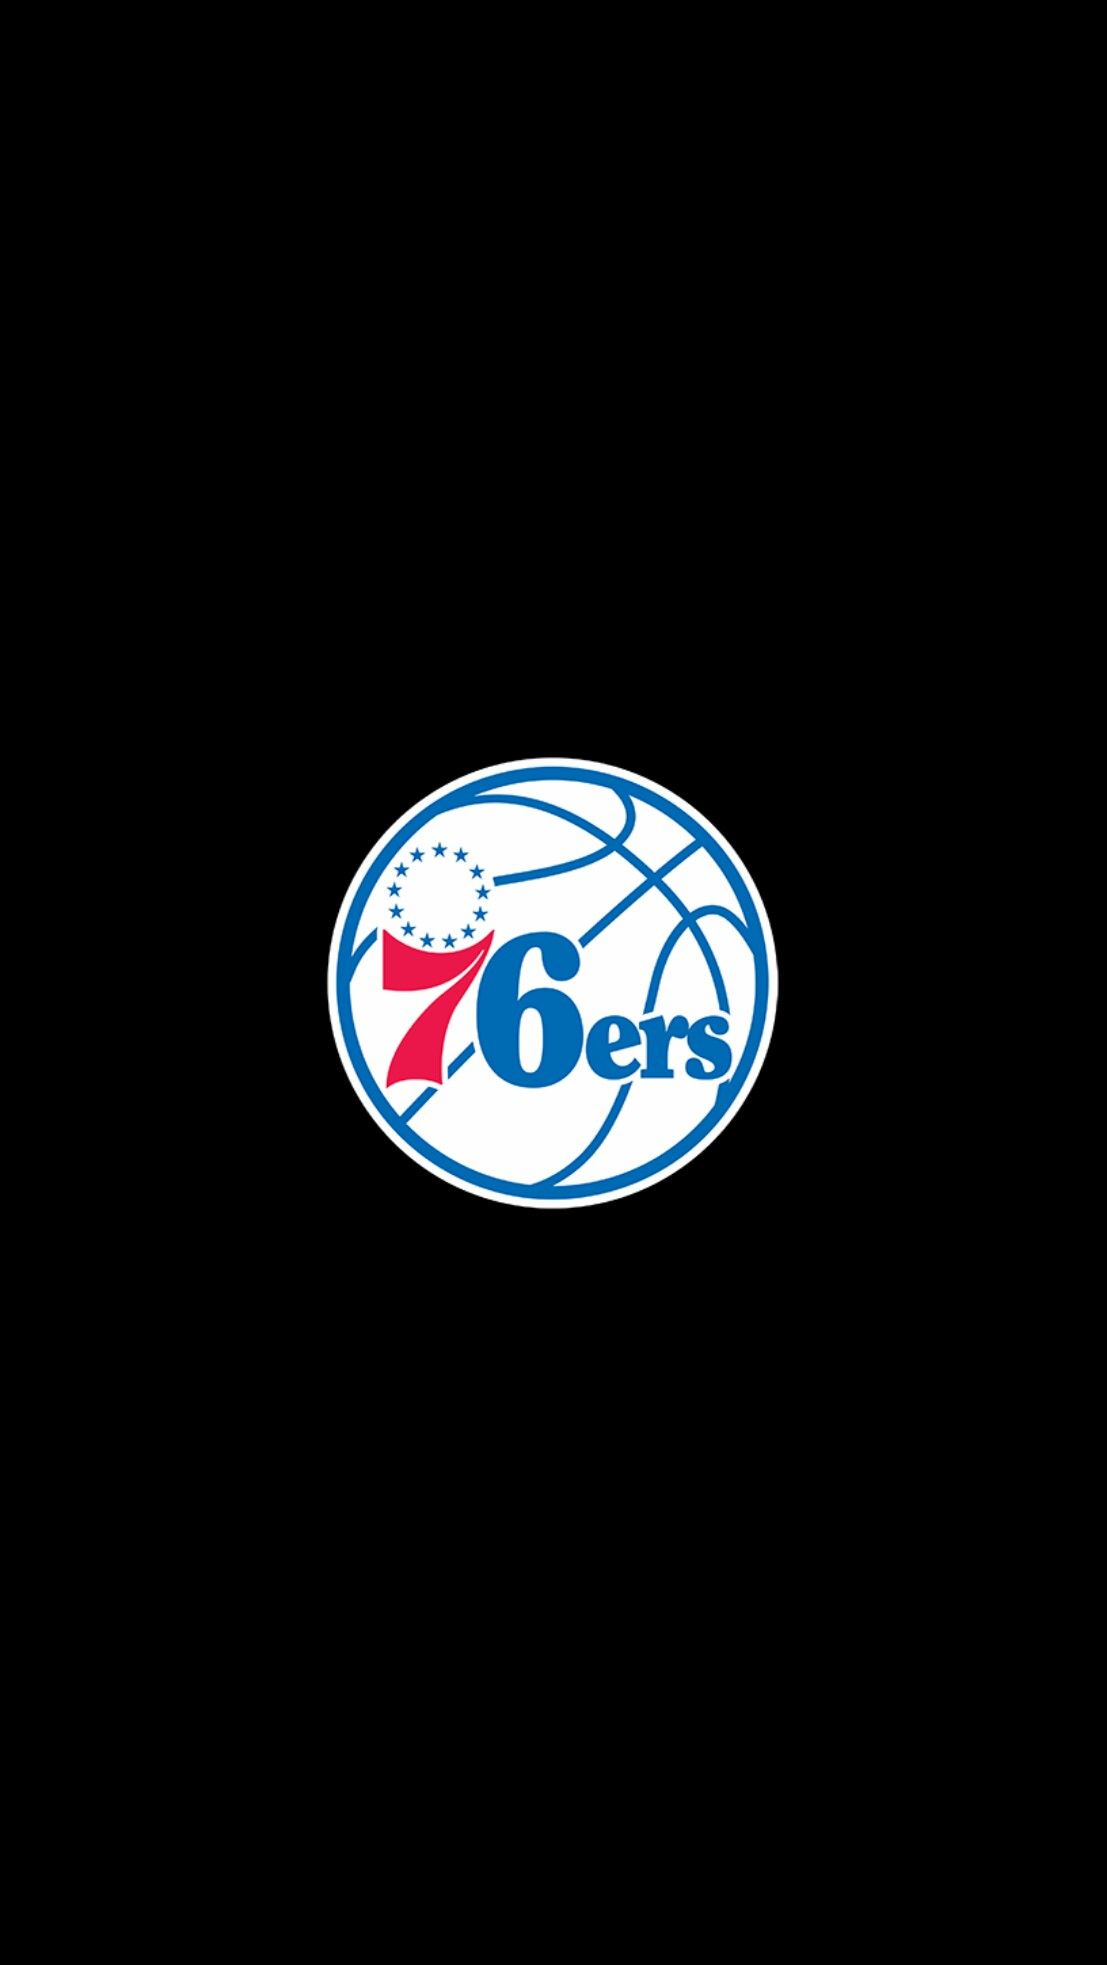 Nba Wallpaper Iphone Android Nba Basketball Nba Wallpapers Sports Team Logos